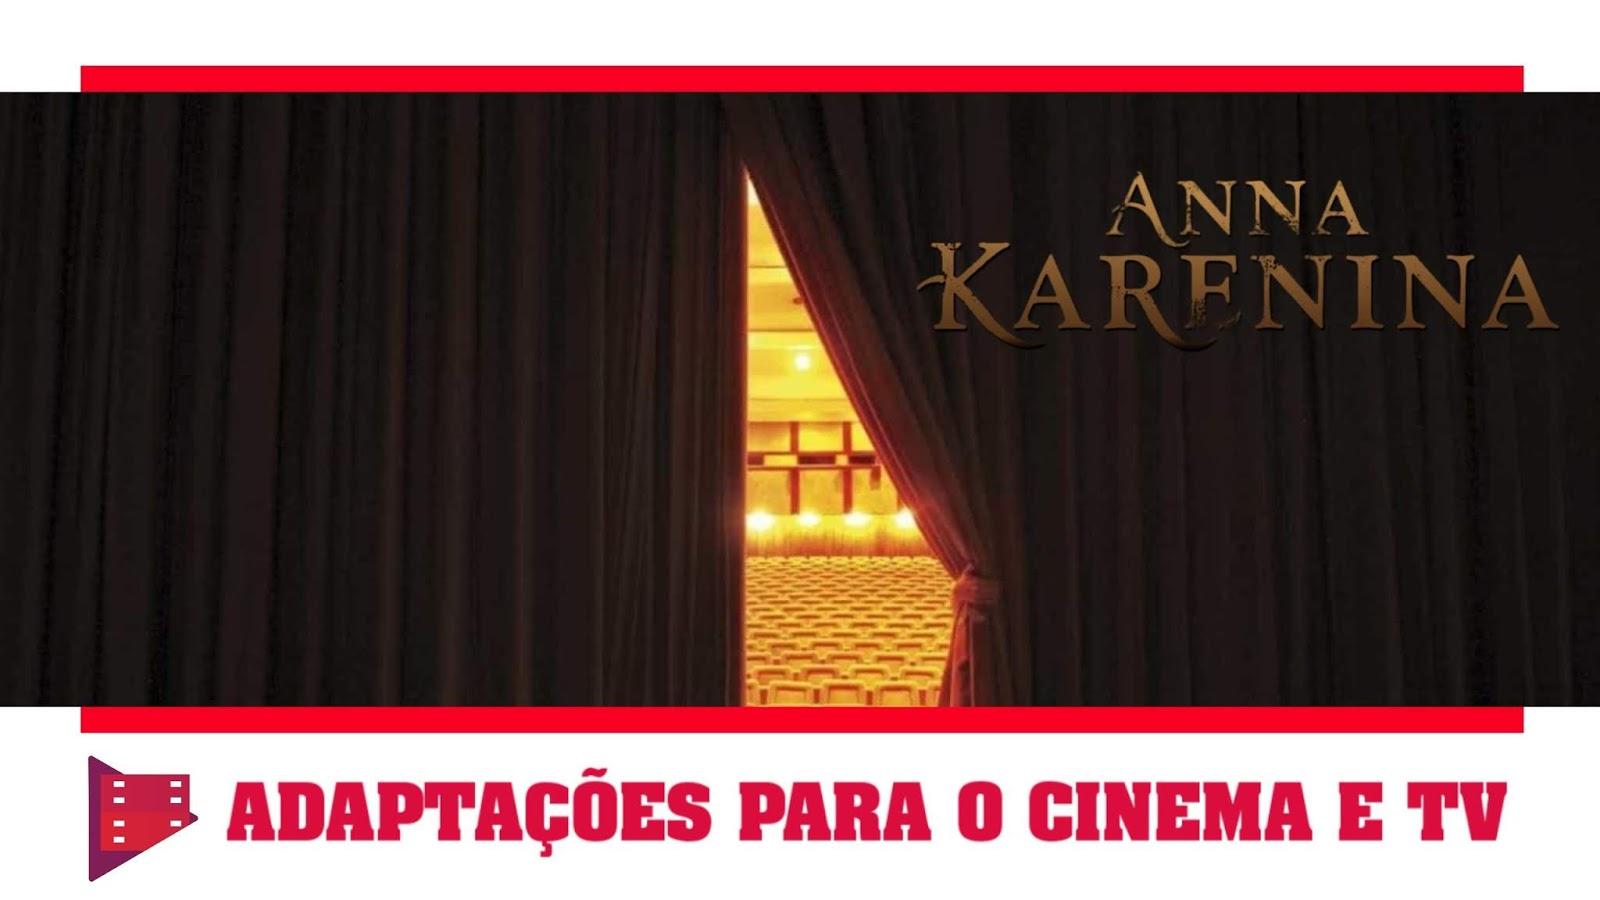 anna-karenina-adaptacoes-para-o-cinema